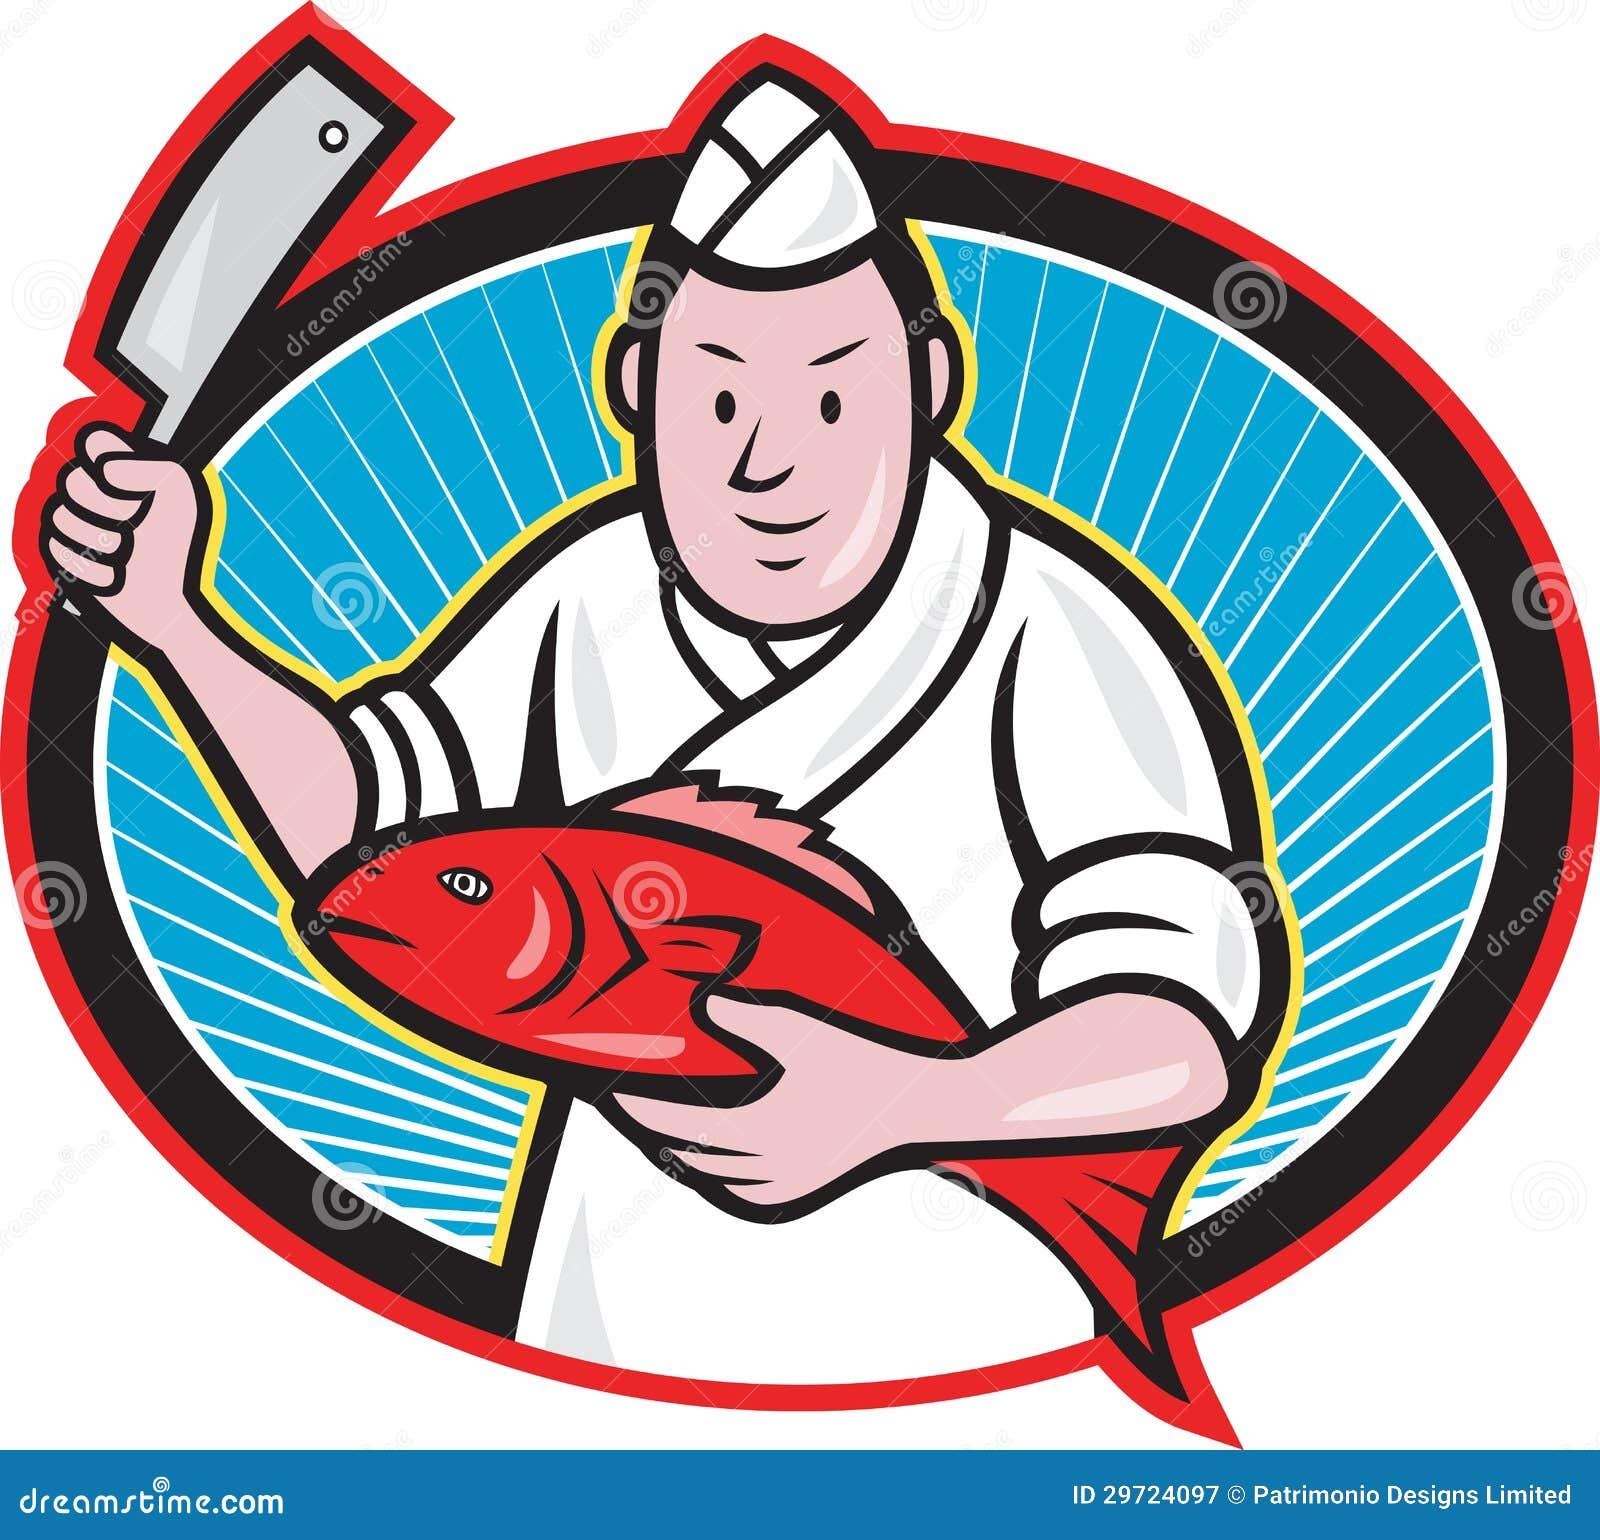 Japanese Fishmonger Butcher Chef Cook Stock Vector - Image ...